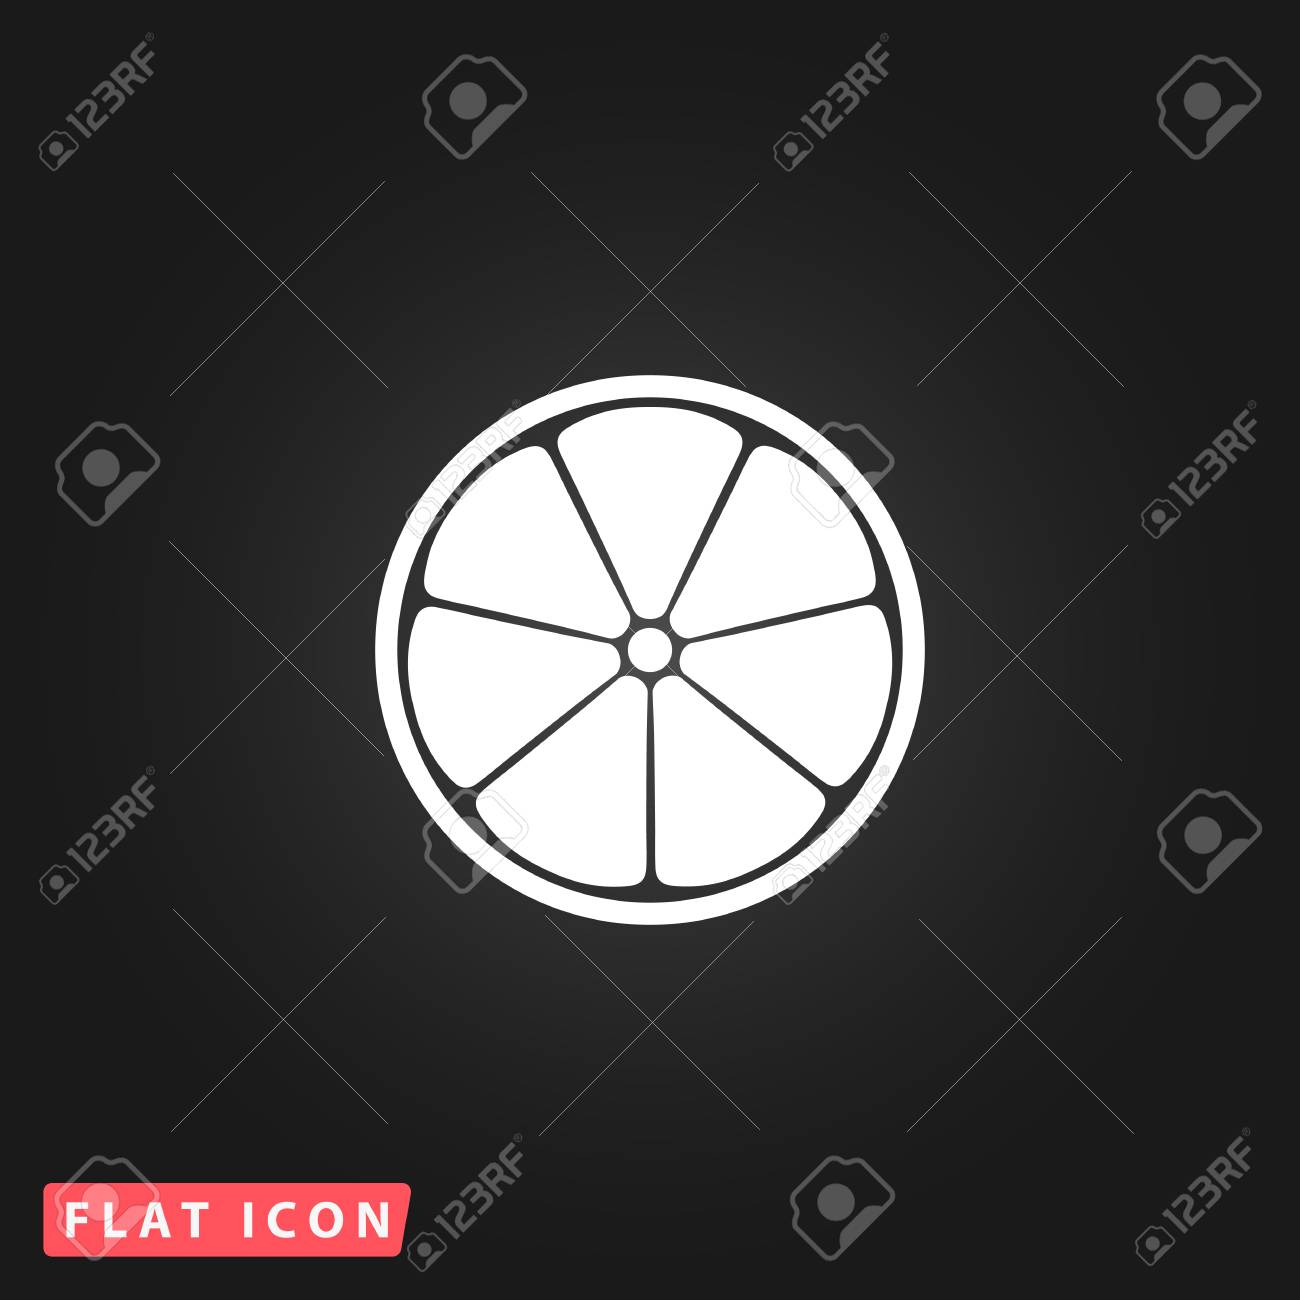 Half Of Lemon White Flat Simple Vector Icon On Black Background